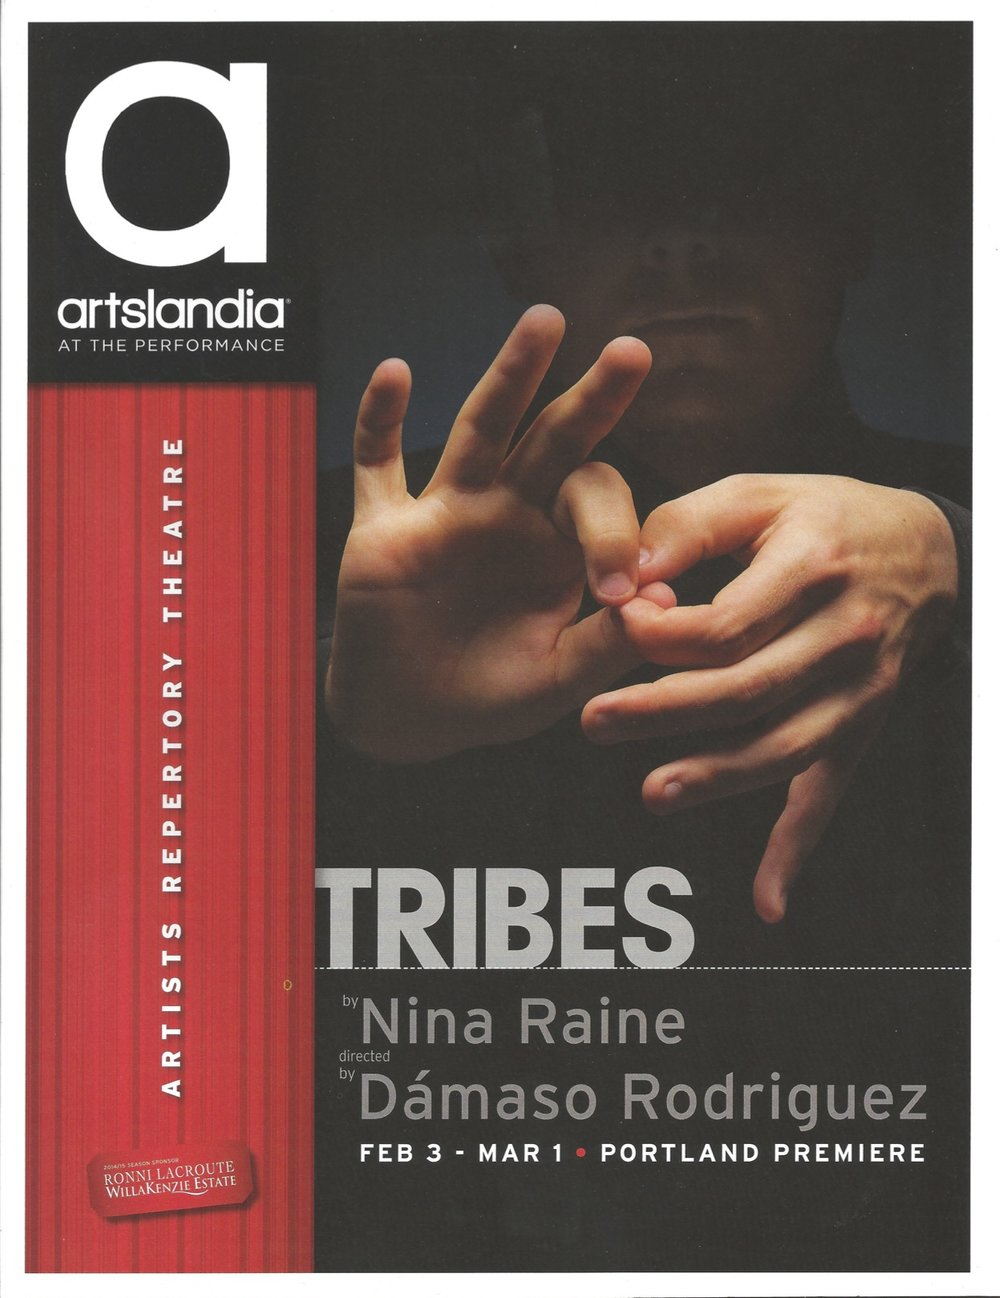 01 Tribes Graphic v11.jpg